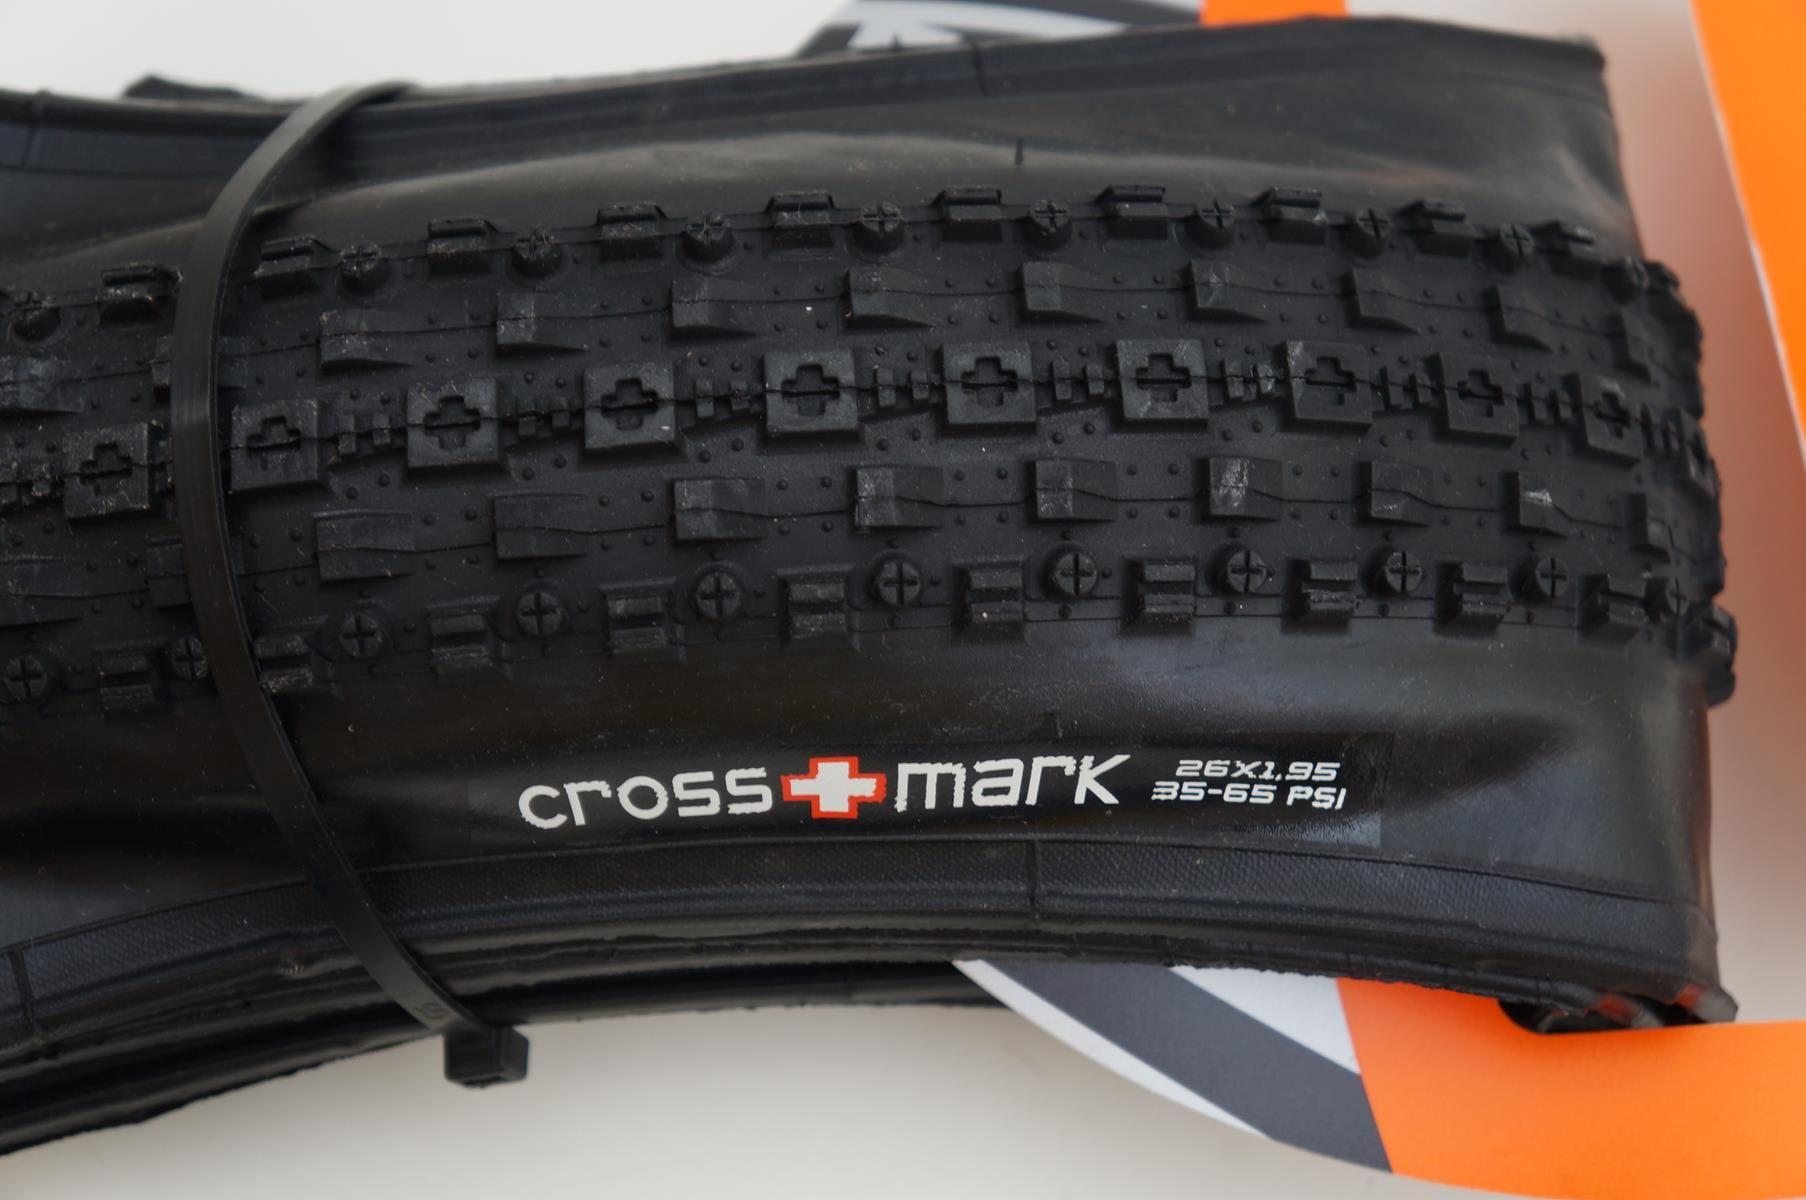 Pneu Mtb Maxxis Crossmark Aro 26 1.95 kevlar Preto 529 gramas